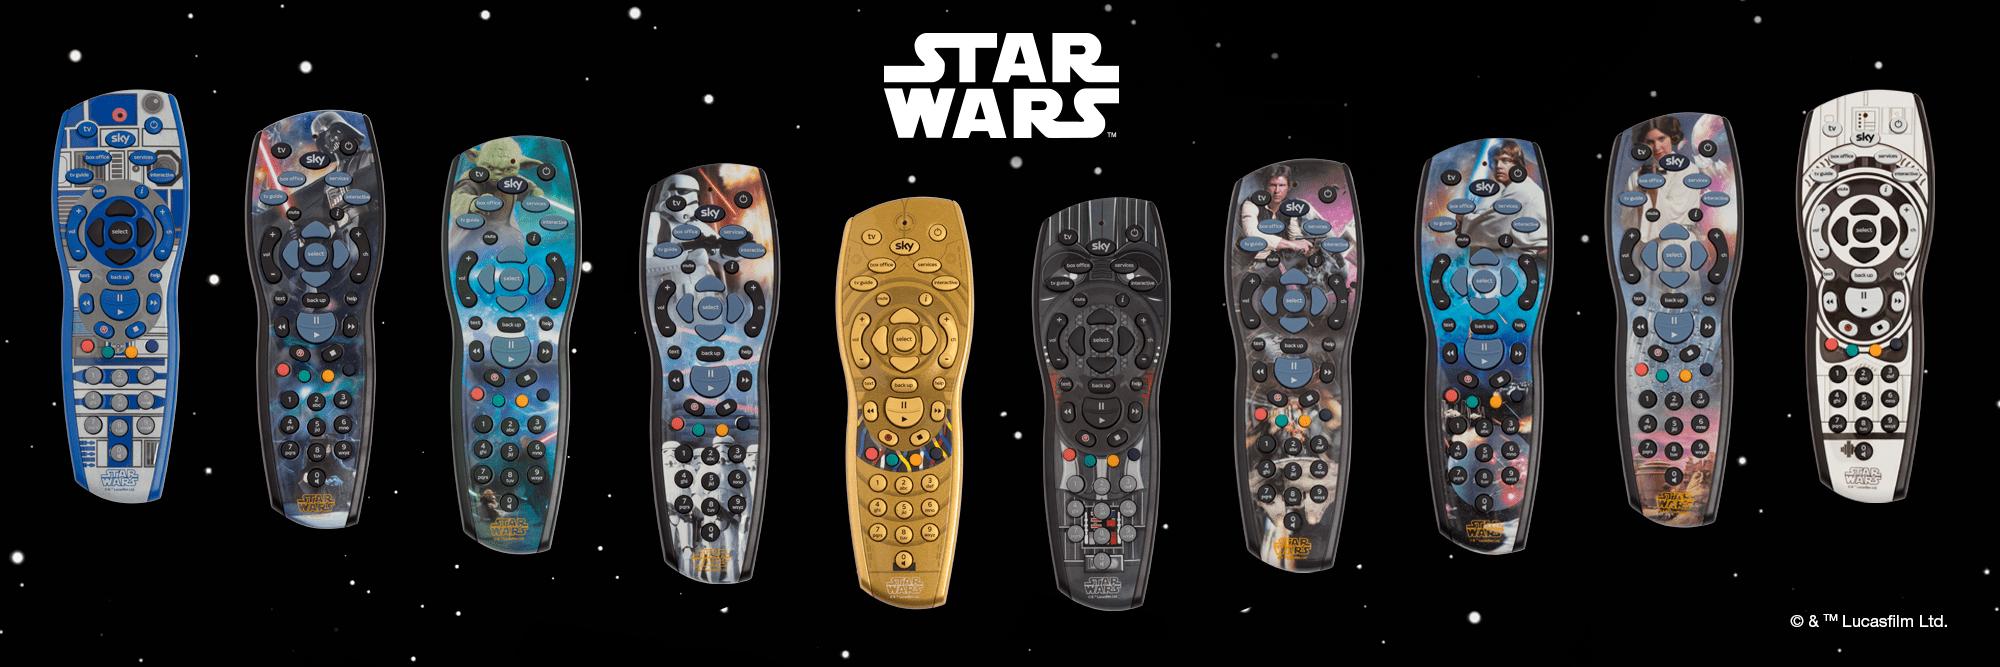 star wars remotes.png